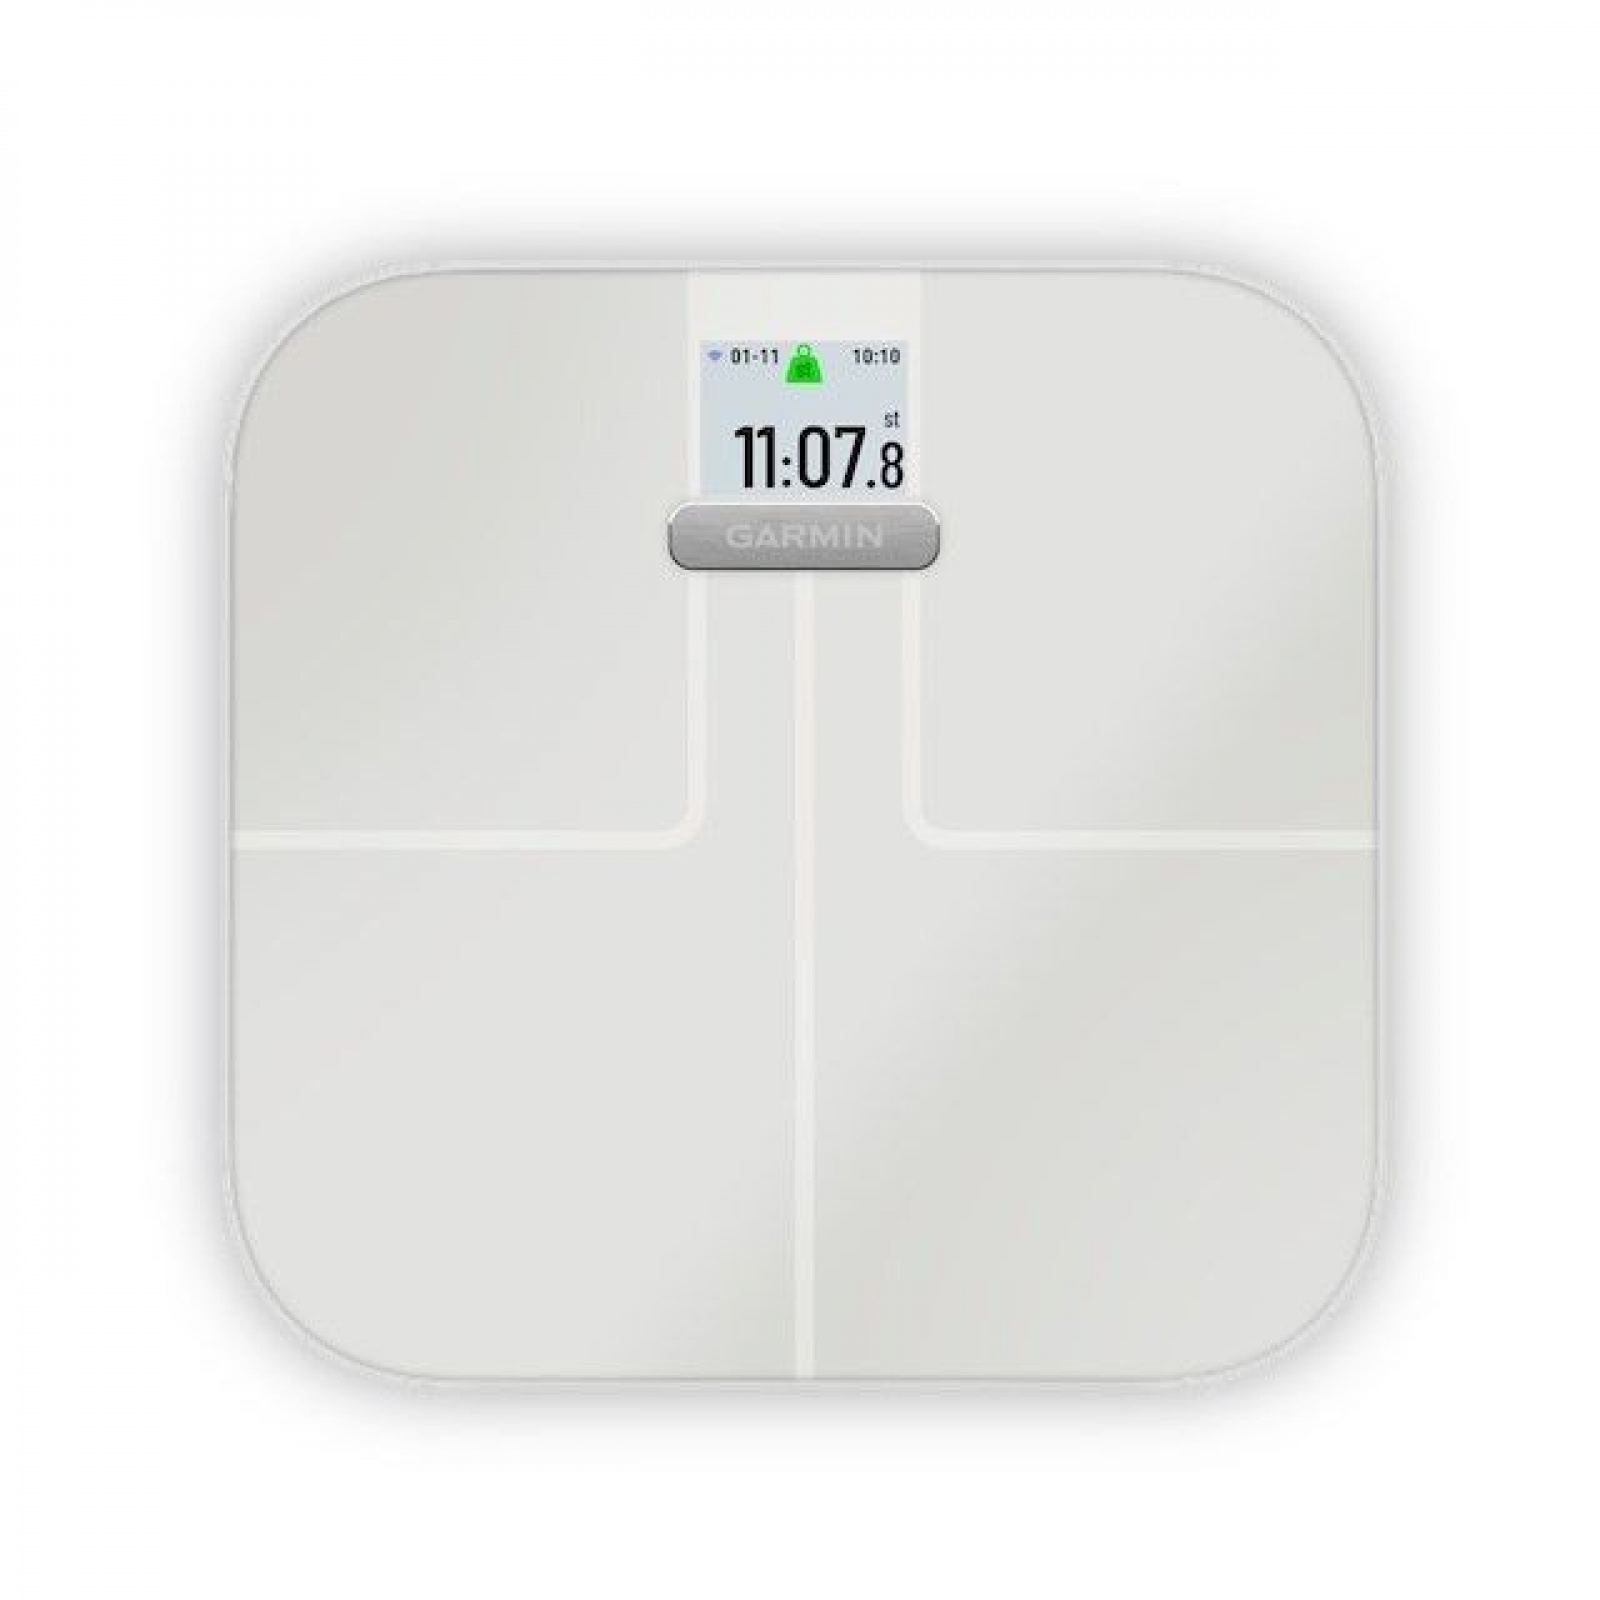 https://www.badec.store/produkty_img/garmin-index-s2-white1602694215L.jpg